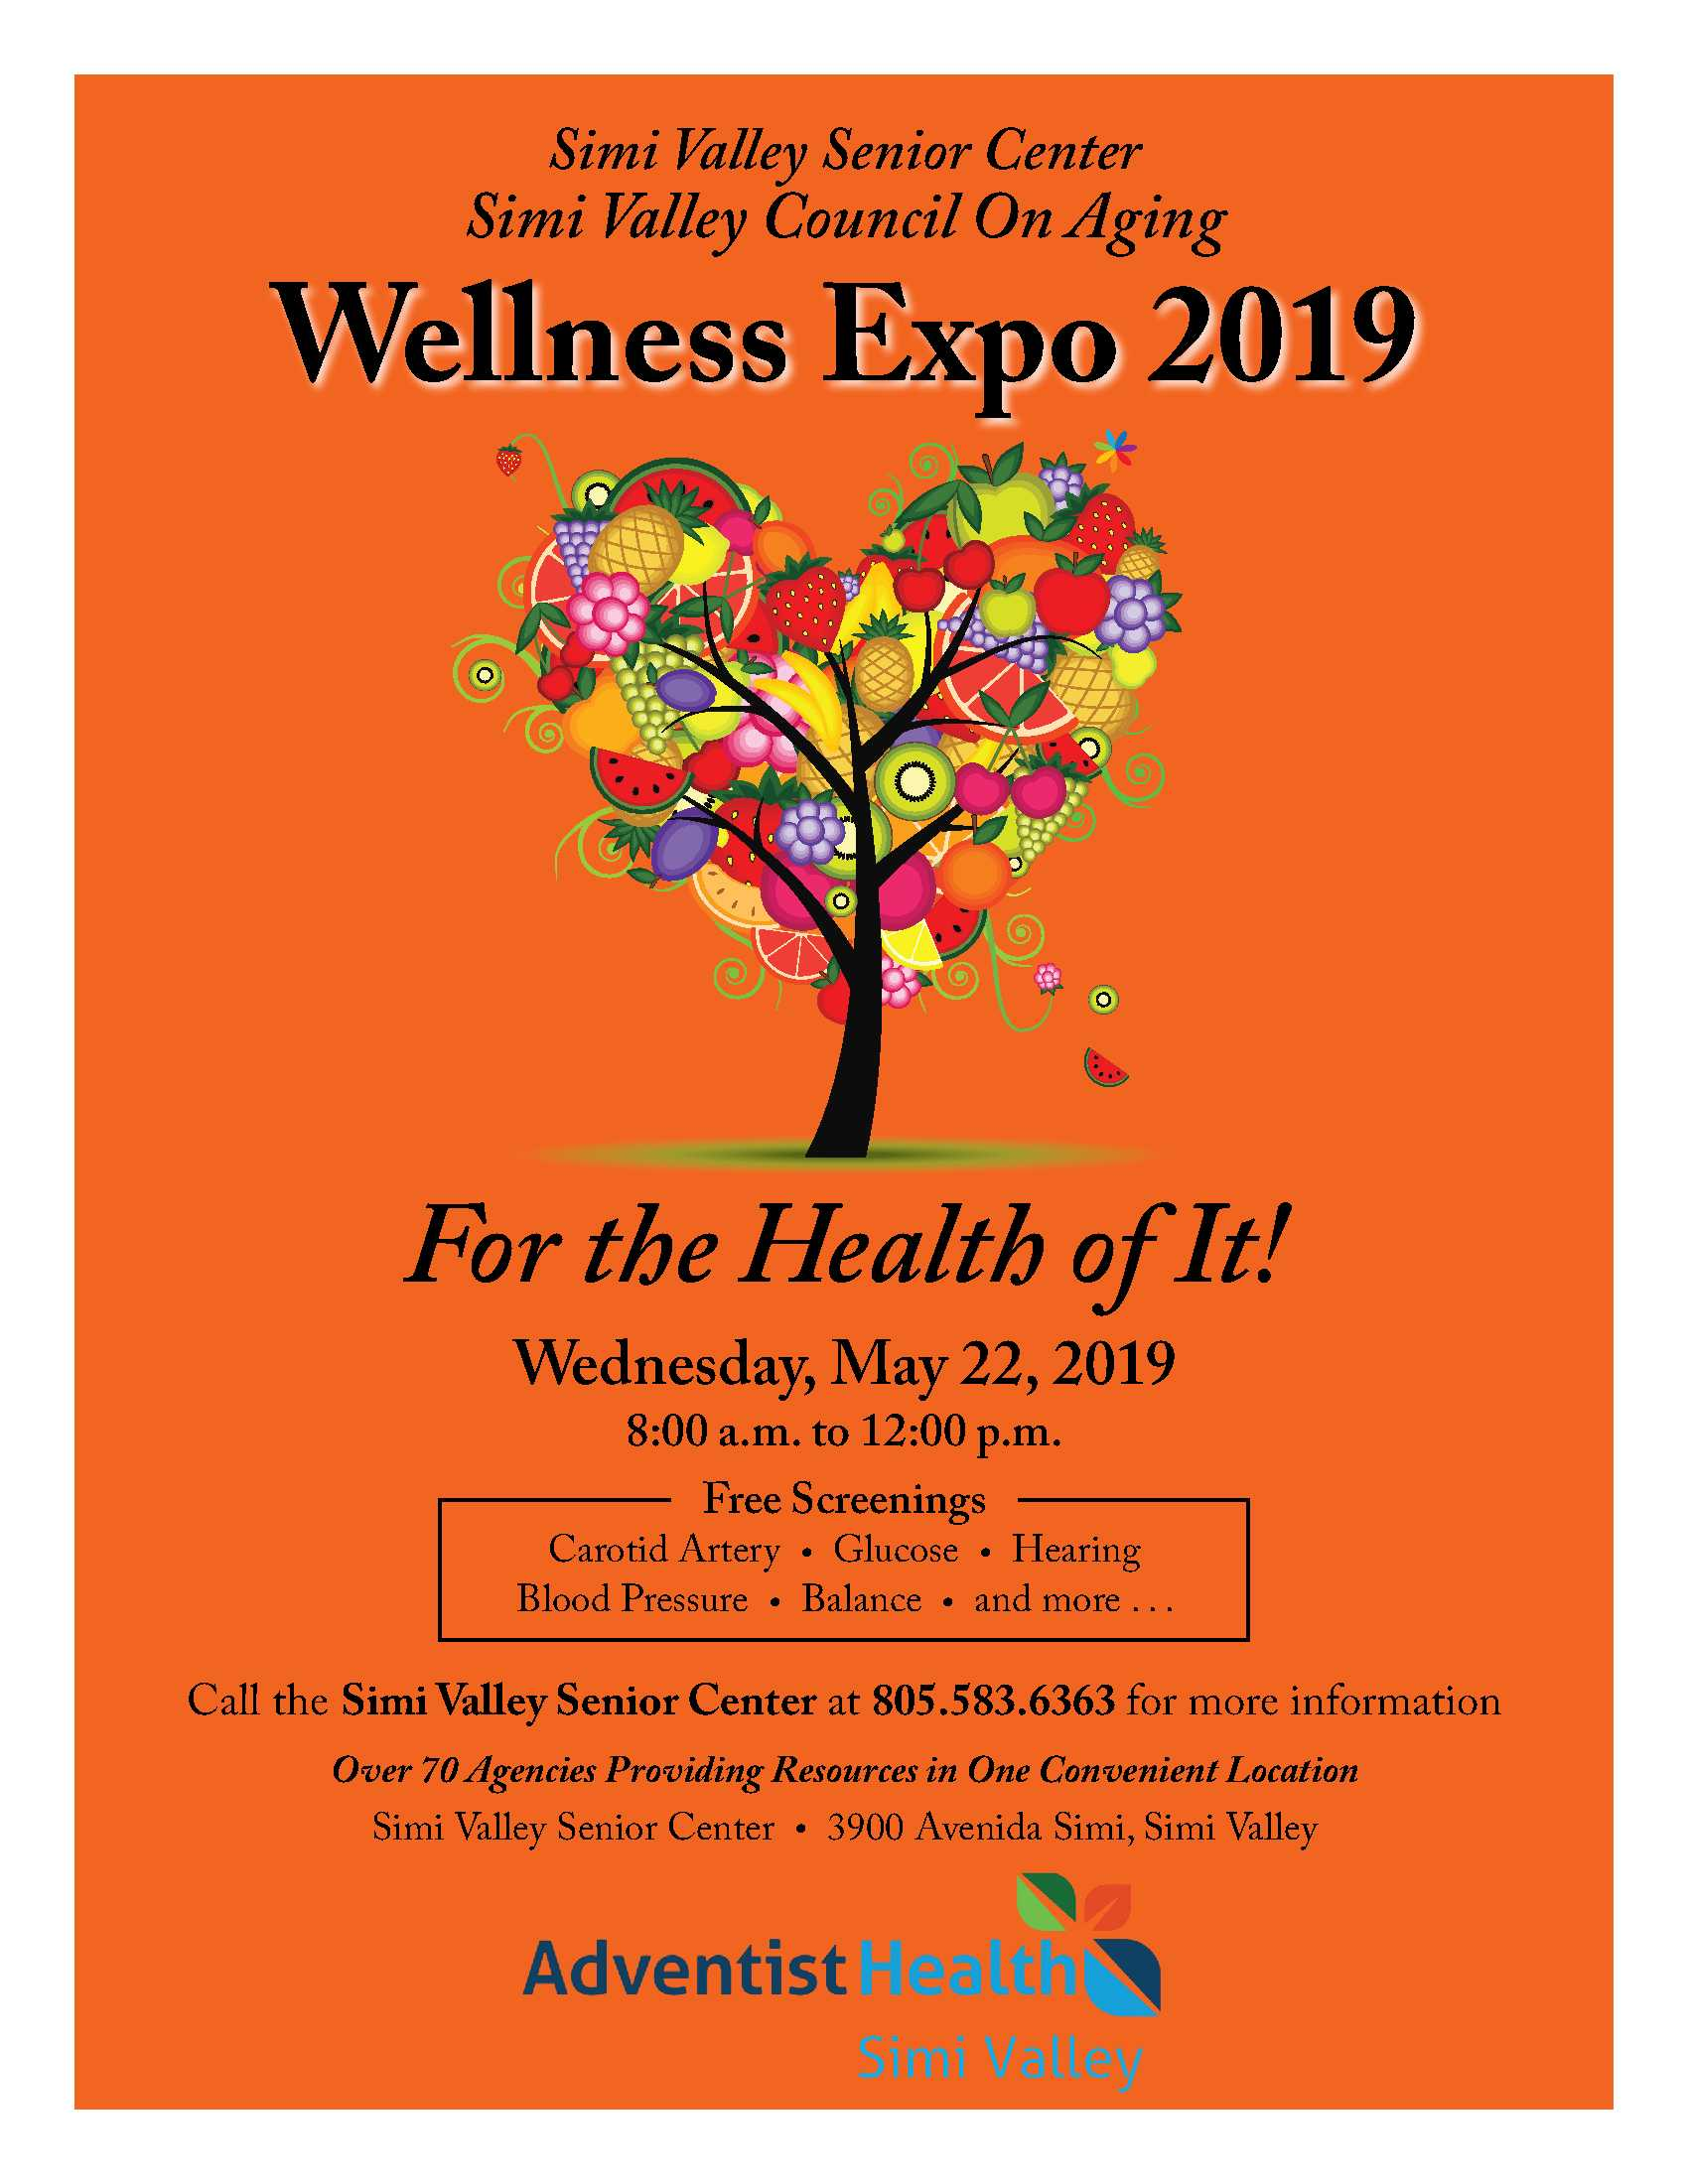 May 22 Wellness Expo 2019